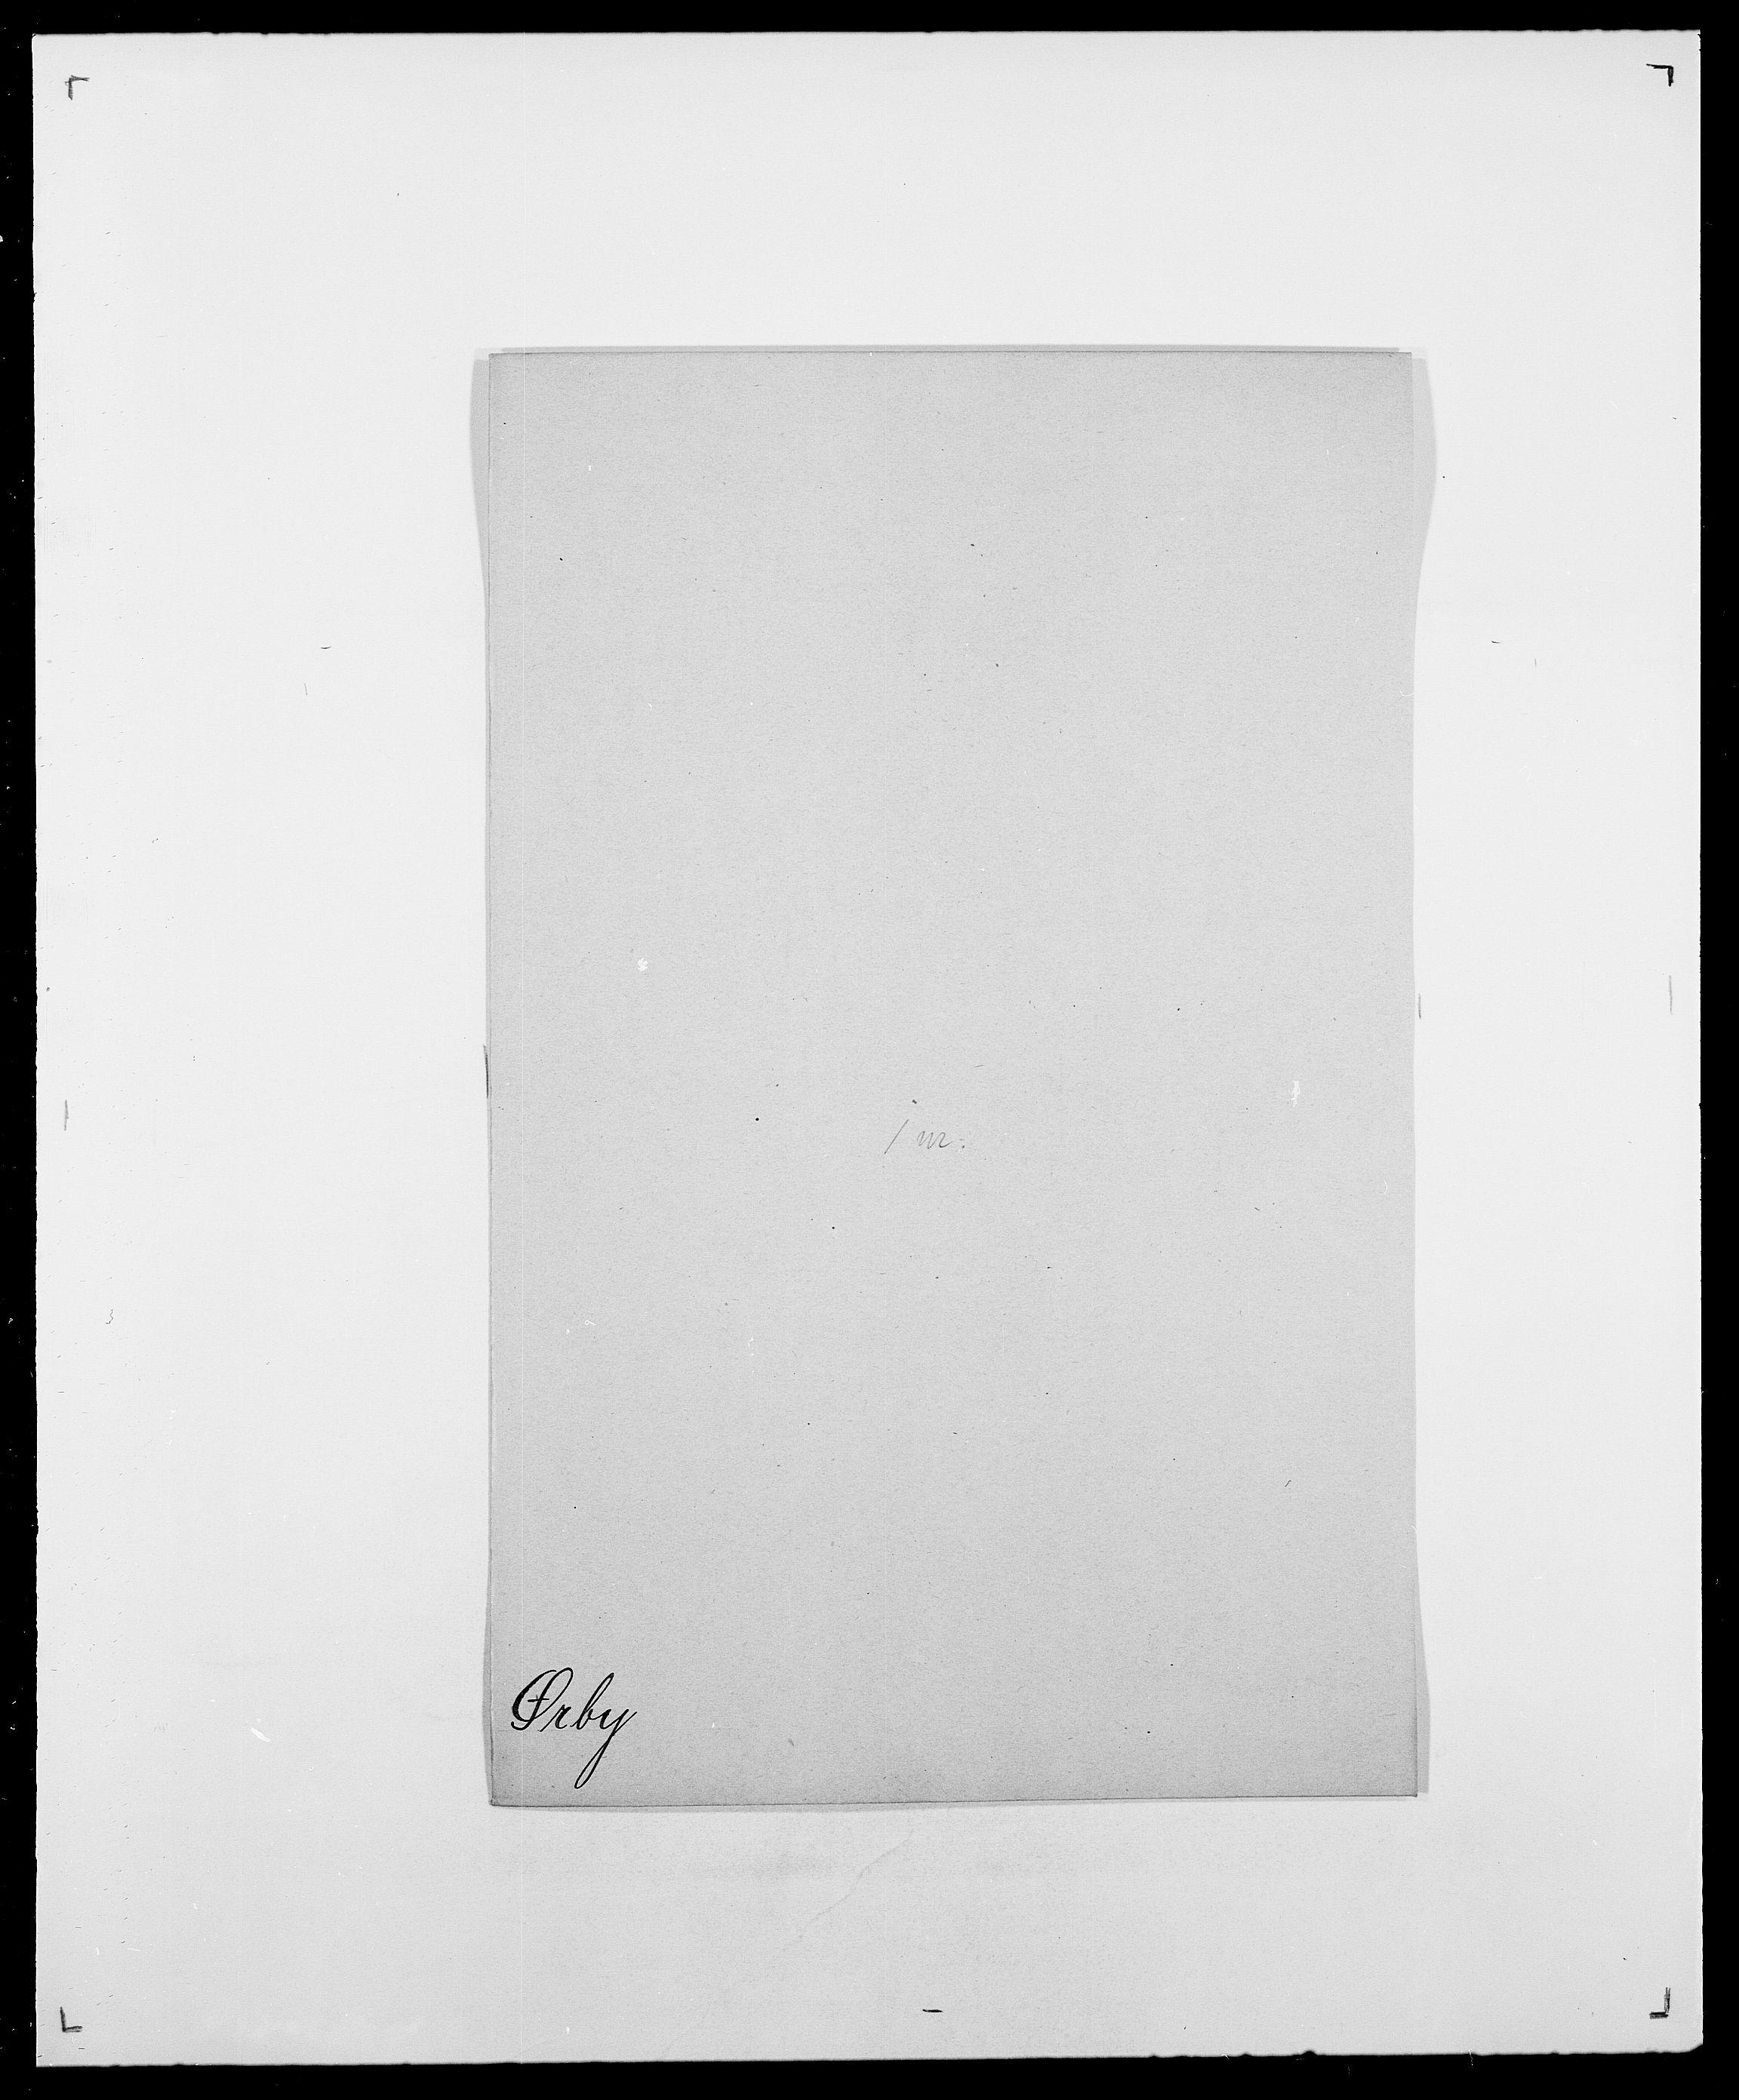 SAO, Delgobe, Charles Antoine - samling, D/Da/L0043: Wulfsberg - v. Zanten, s. 306